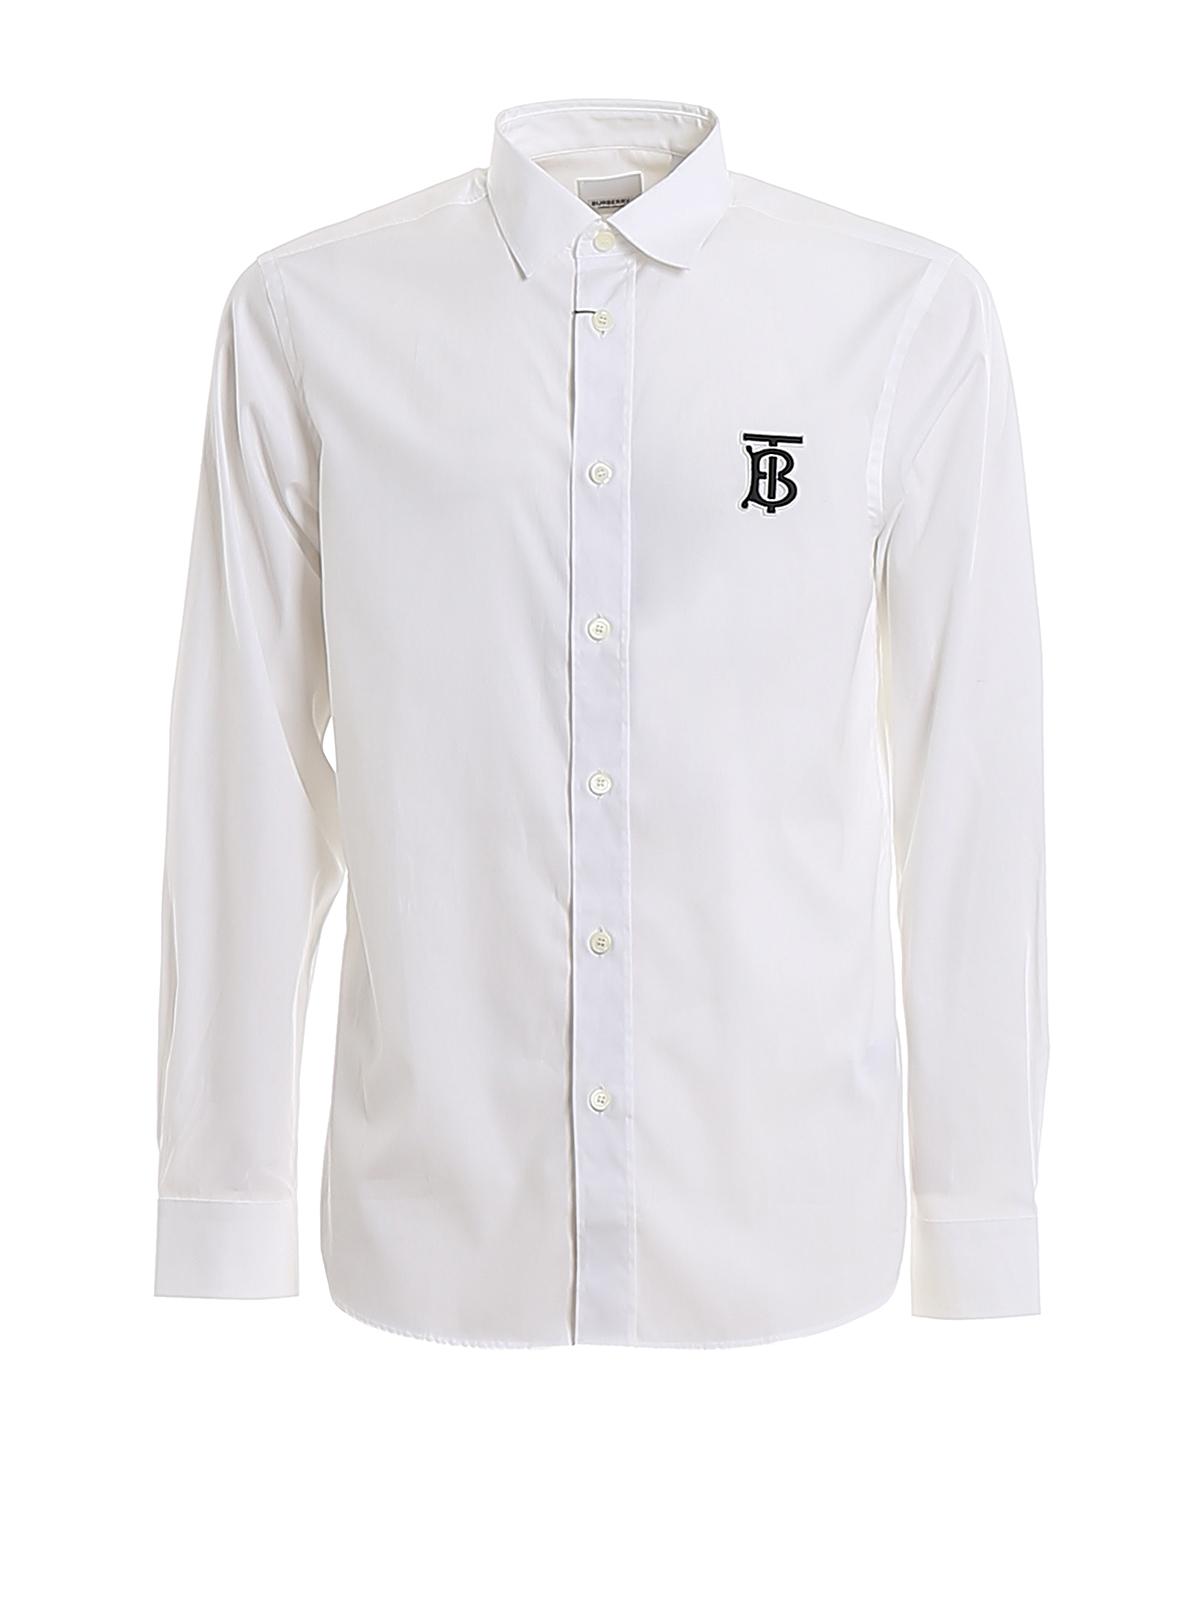 Burberry Tops Spenser TB monogram embroidery shirt